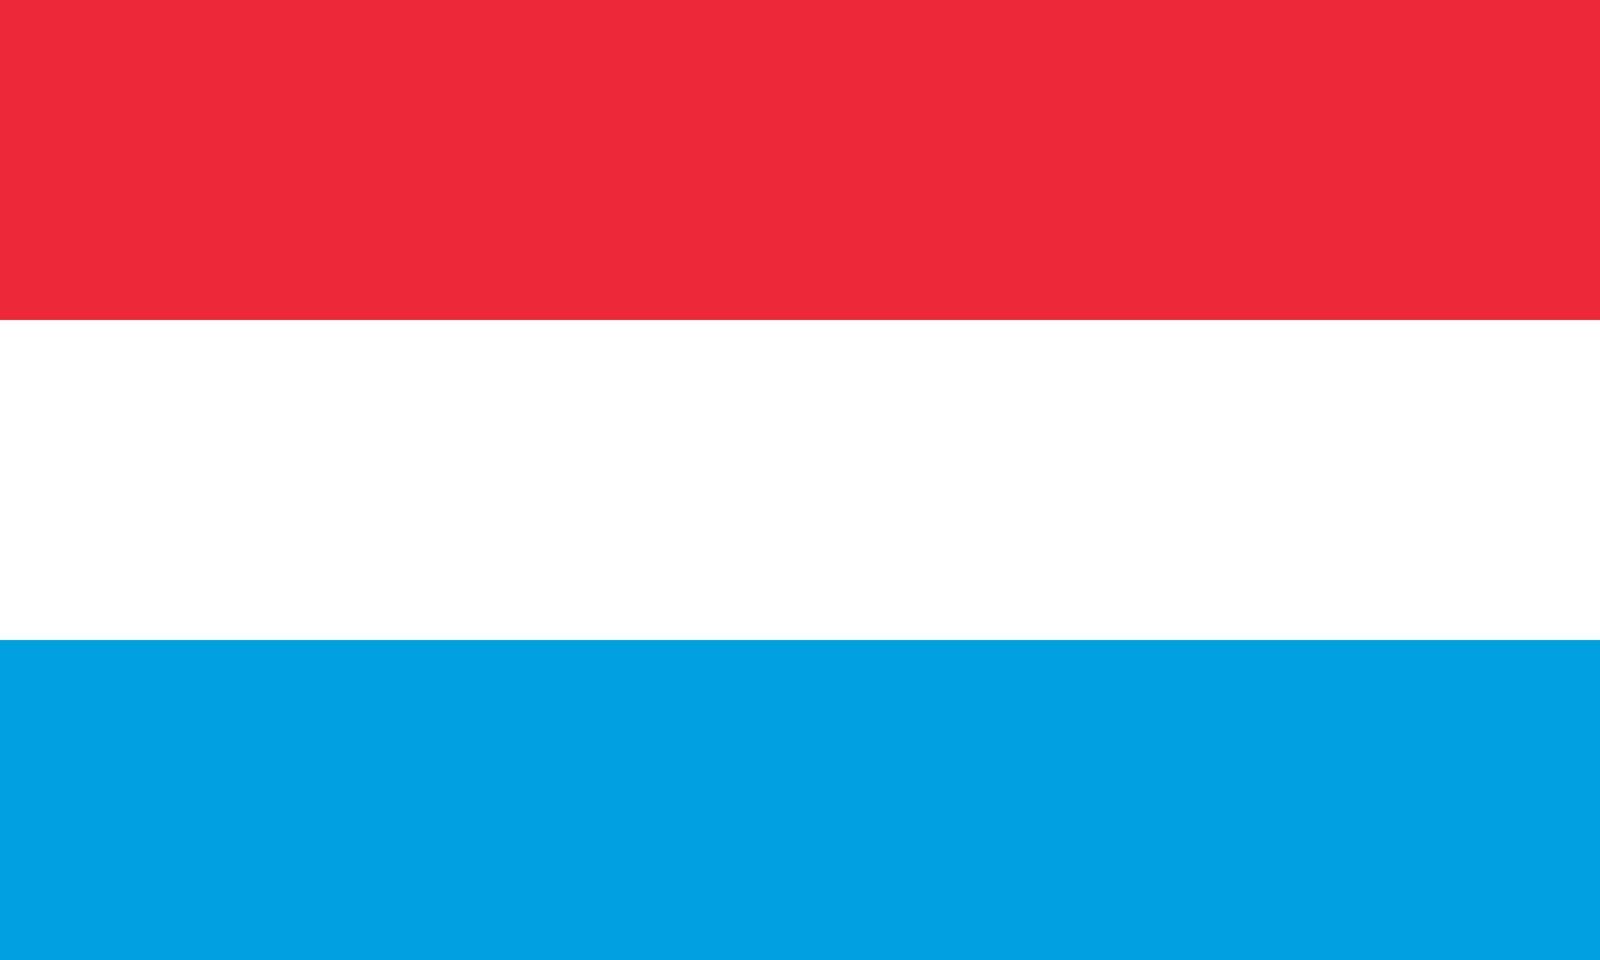 EWHEELZ_main_street_legal_luxemburg_1